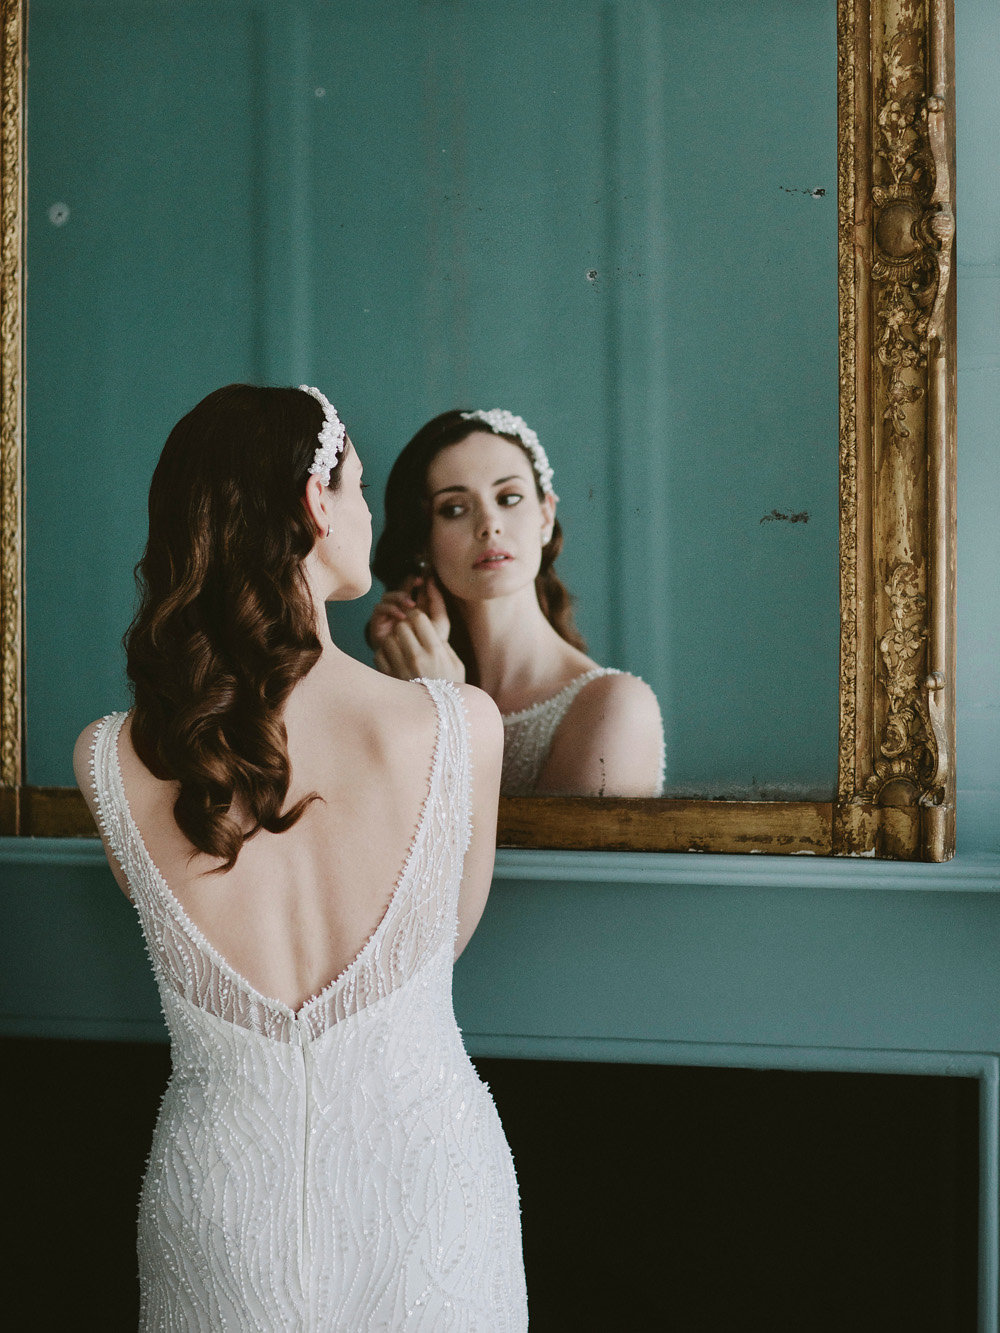 Eliza-Jane-Howell-bride-gets-ready